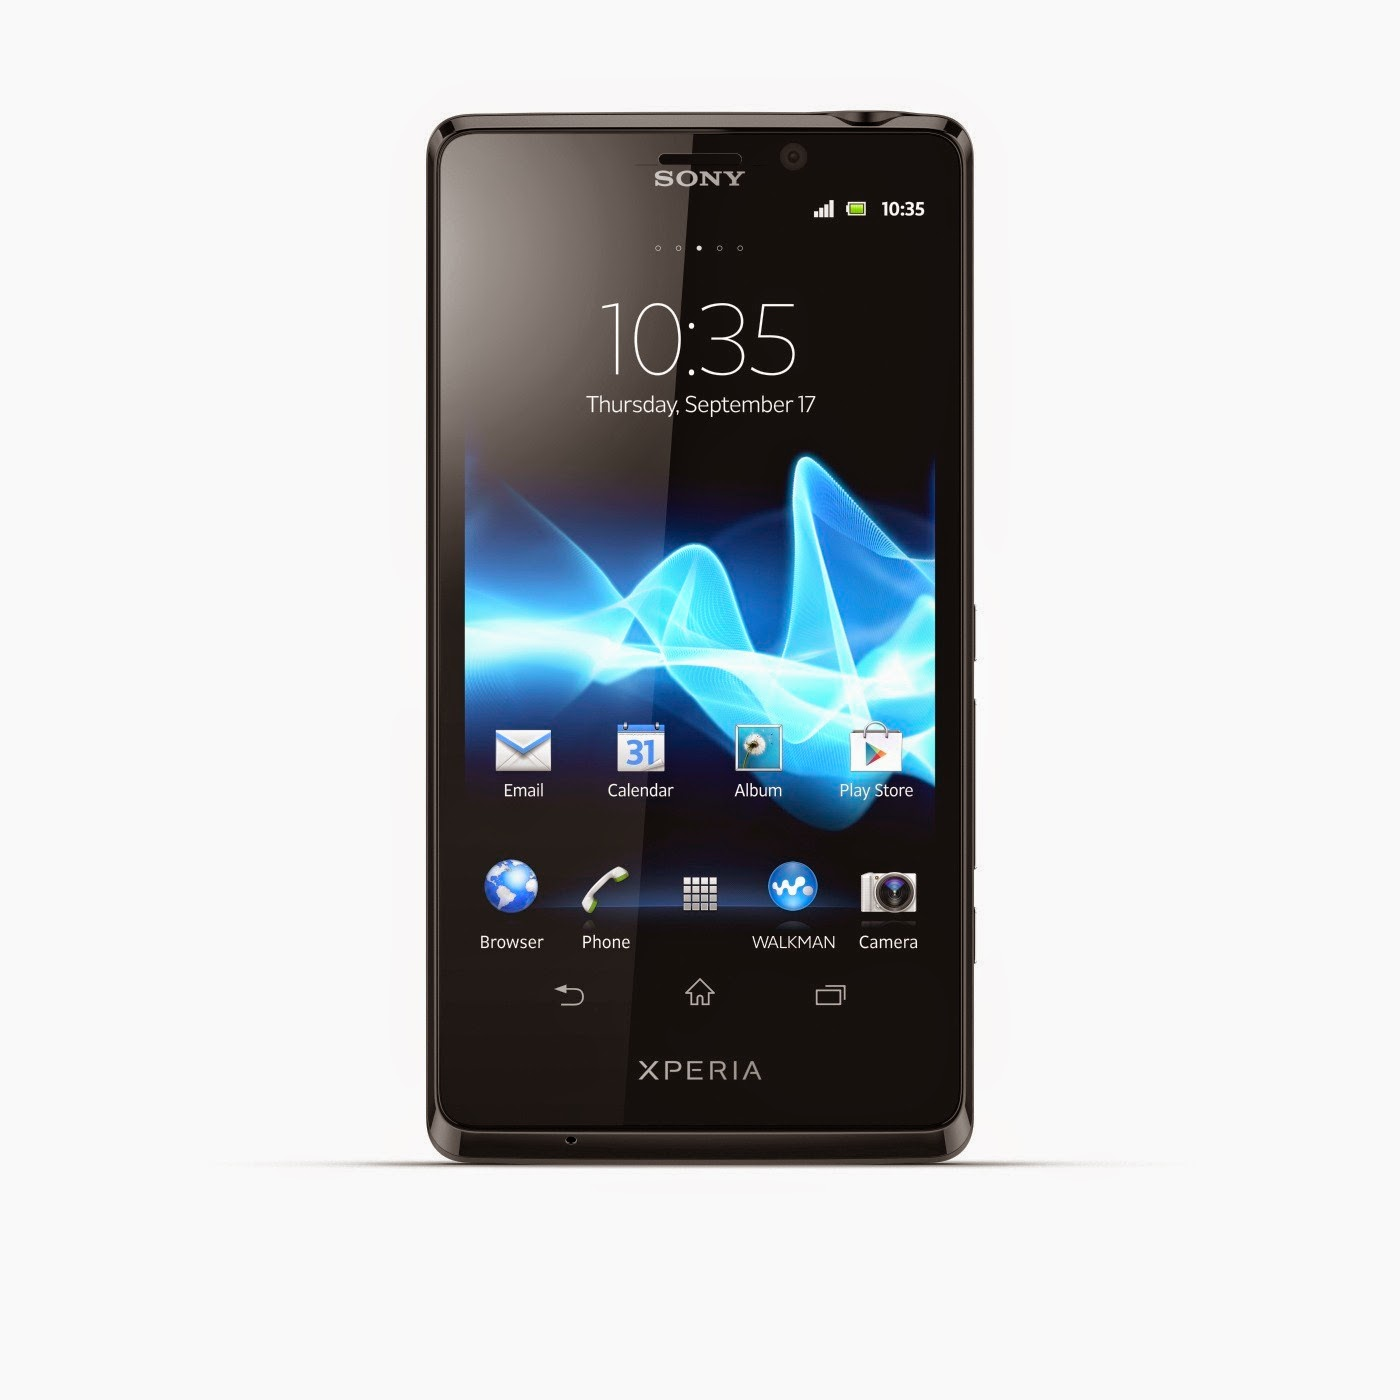 Harga Smartphone Android Sony Terbaru Februari 2016